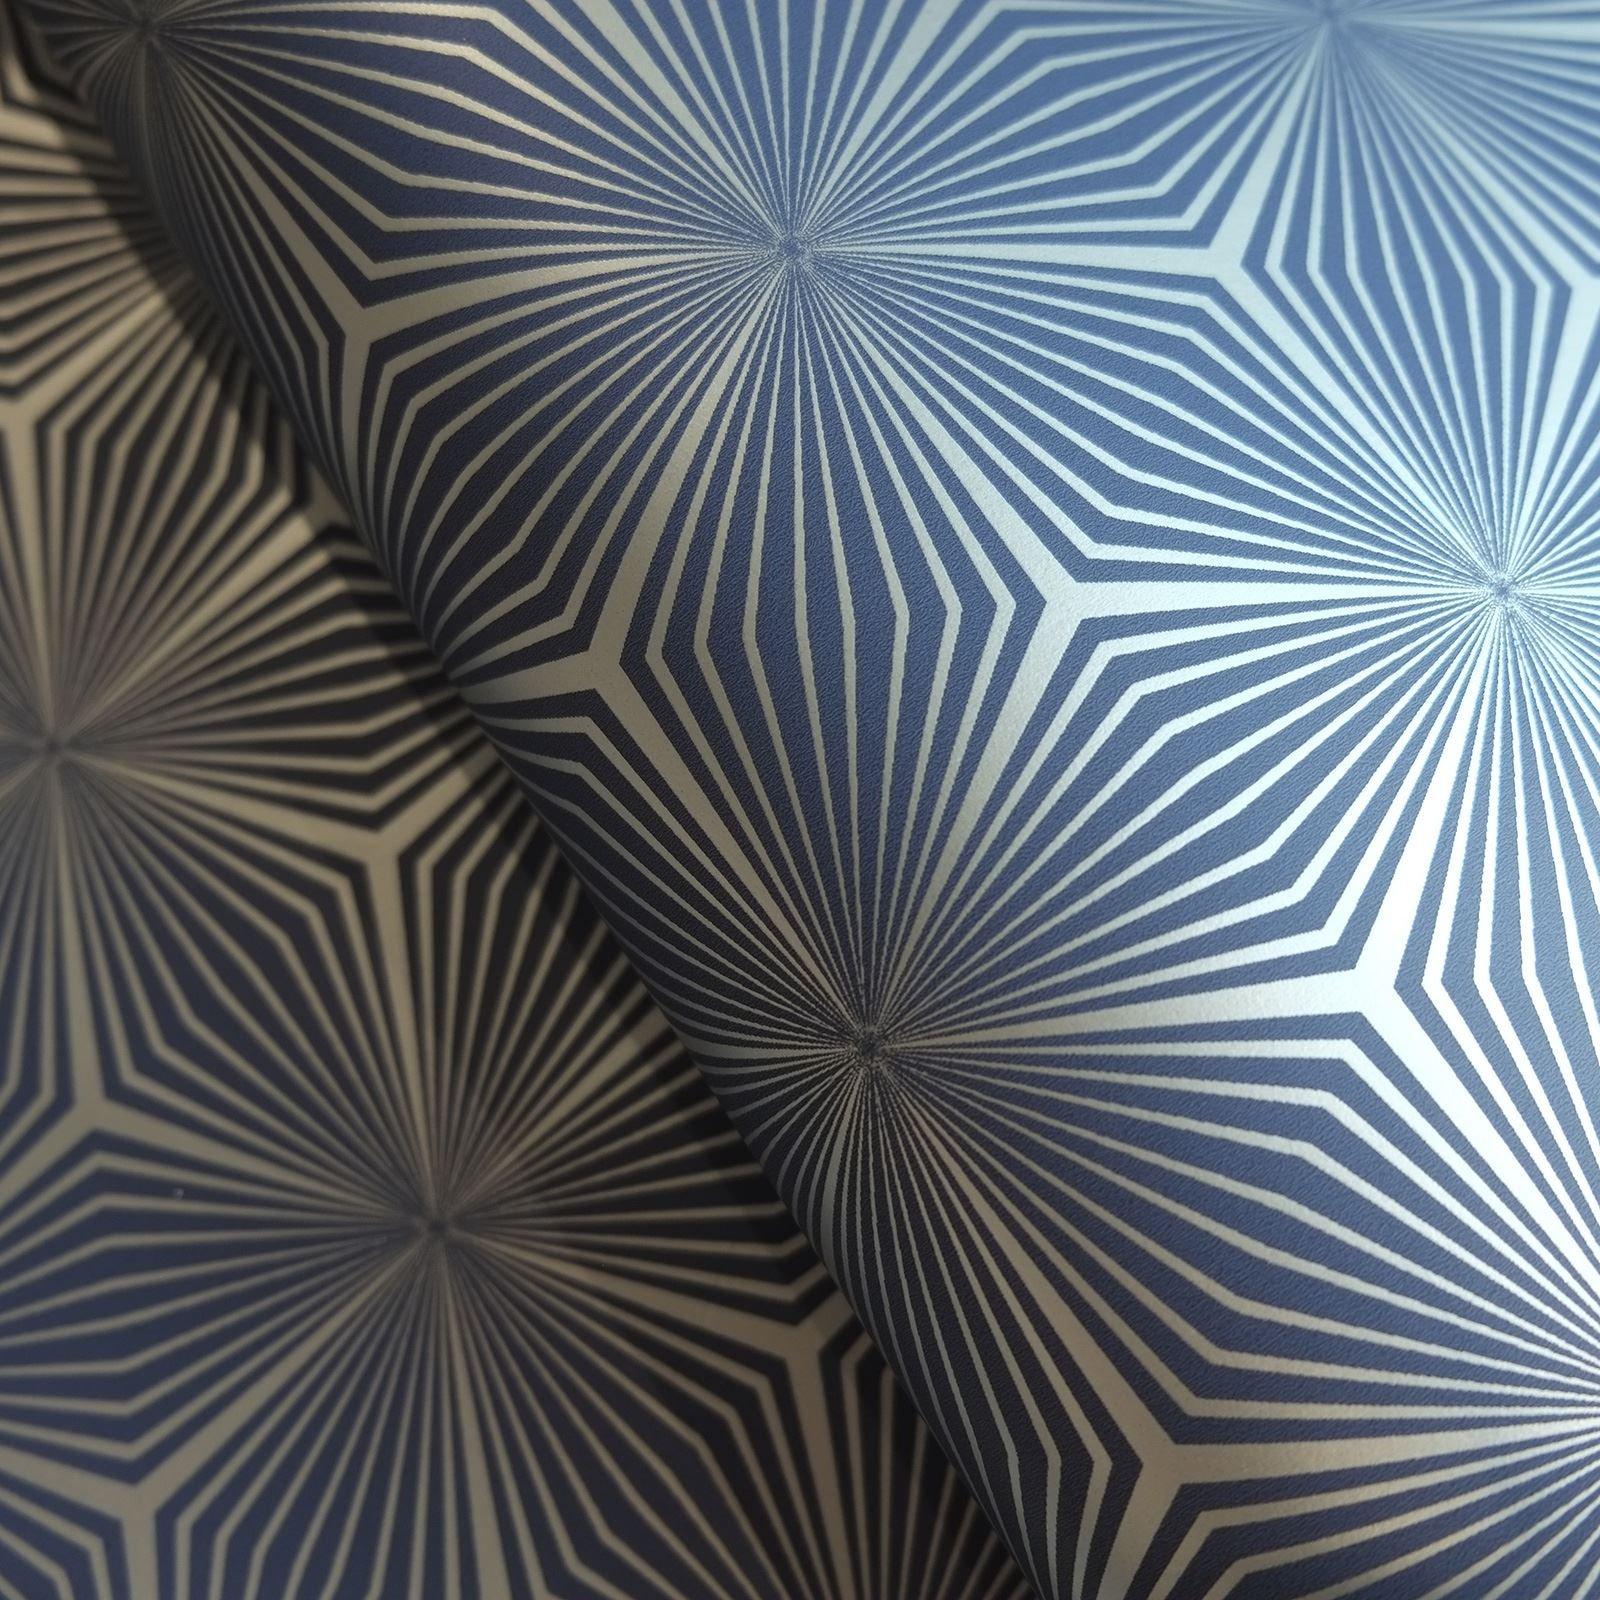 Holden Metallic Feather Pattern Wallpaper Leaf Motif Modern Textured 50080